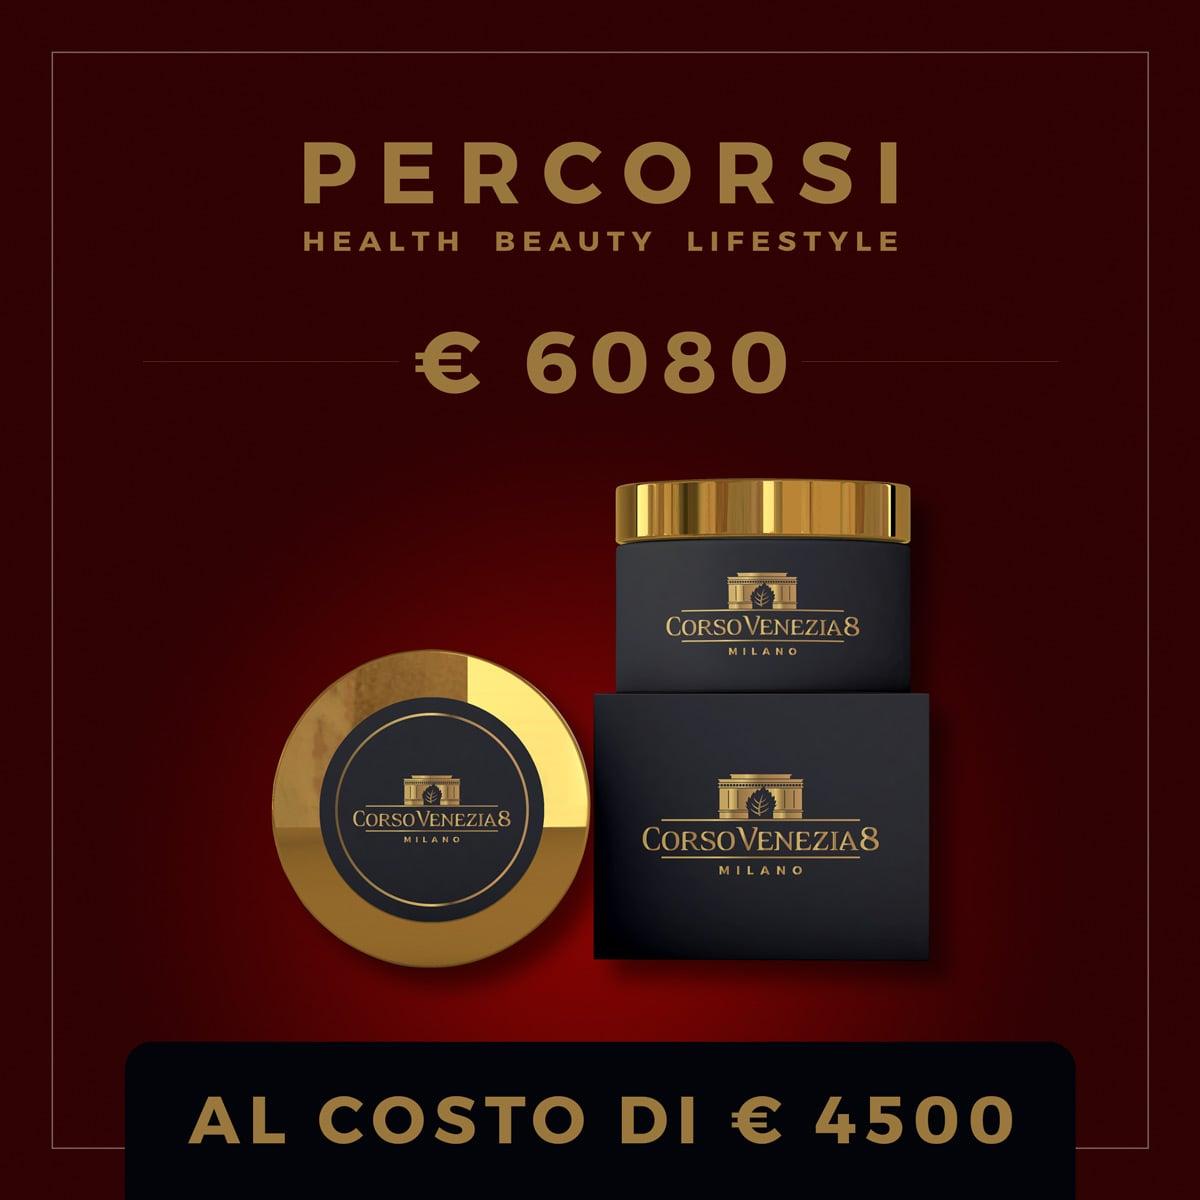 Percorsi Estetici - Voucher € 6080